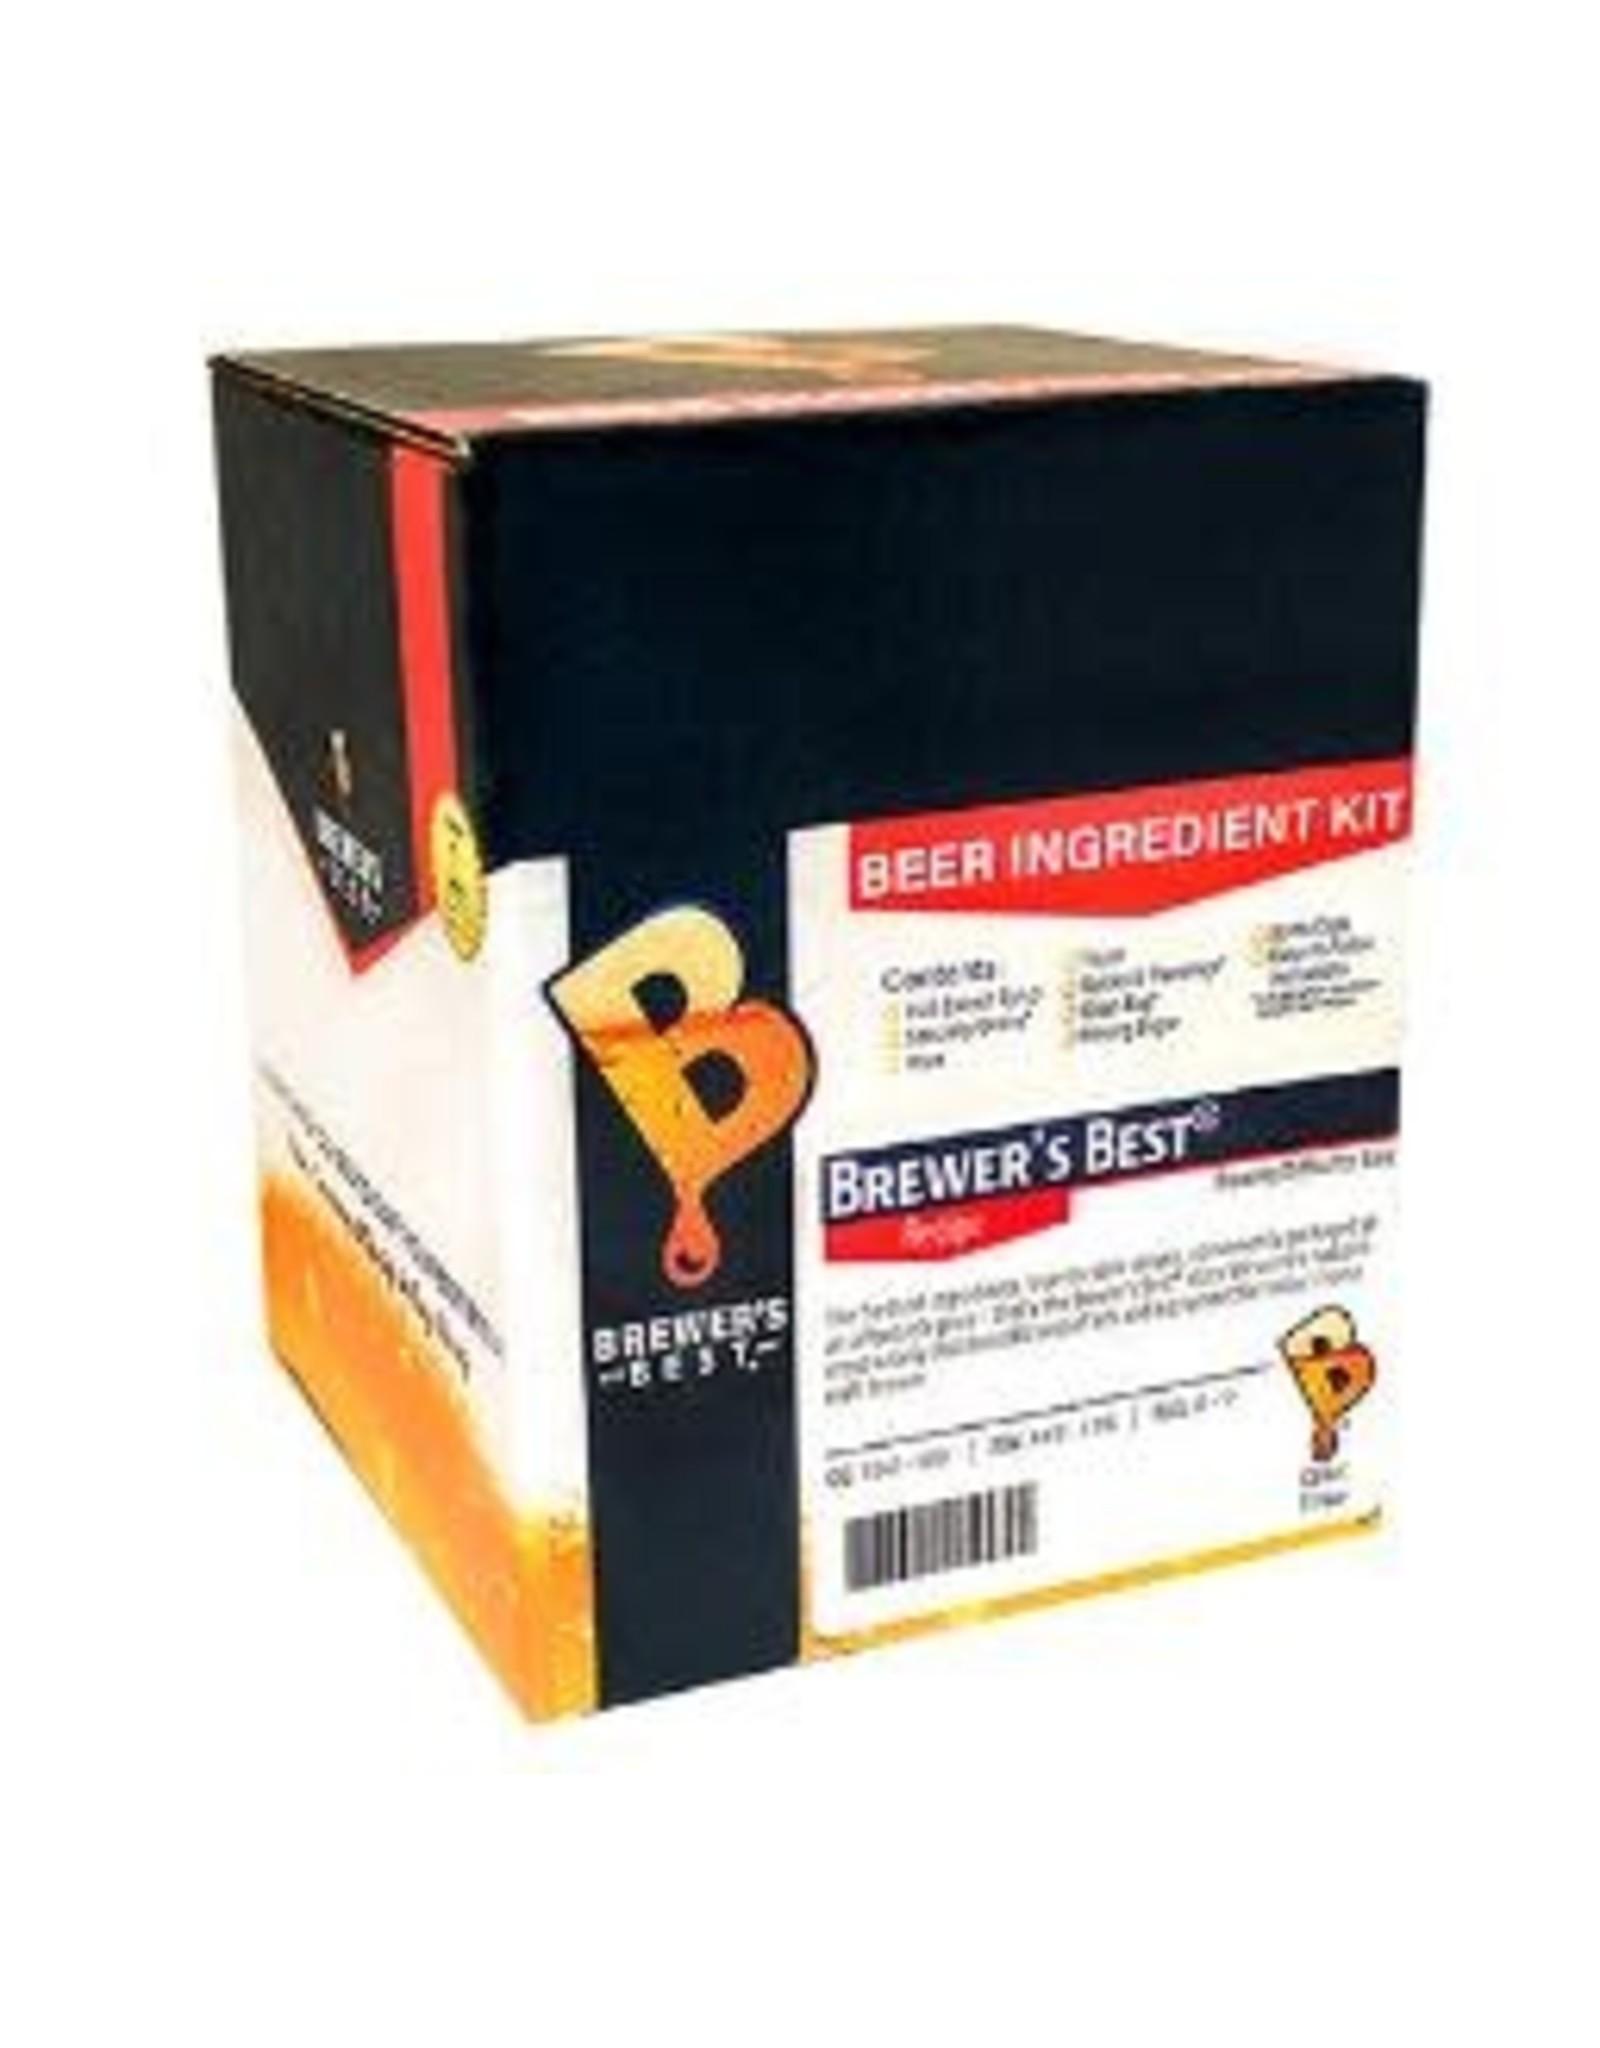 1418 BREWERS BEST SAISON KIT